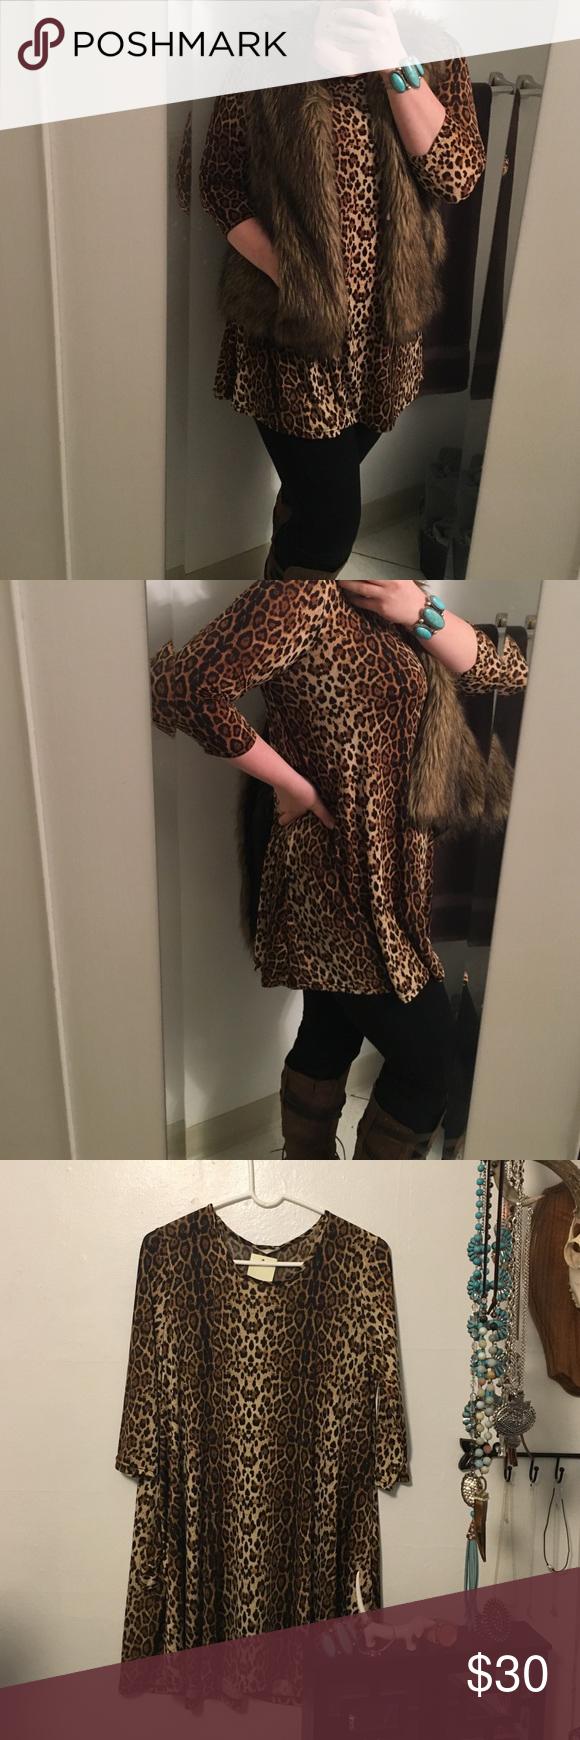 Leopard dress NWT. smoke free home, open to offers Southern Stitch Dresses Midi